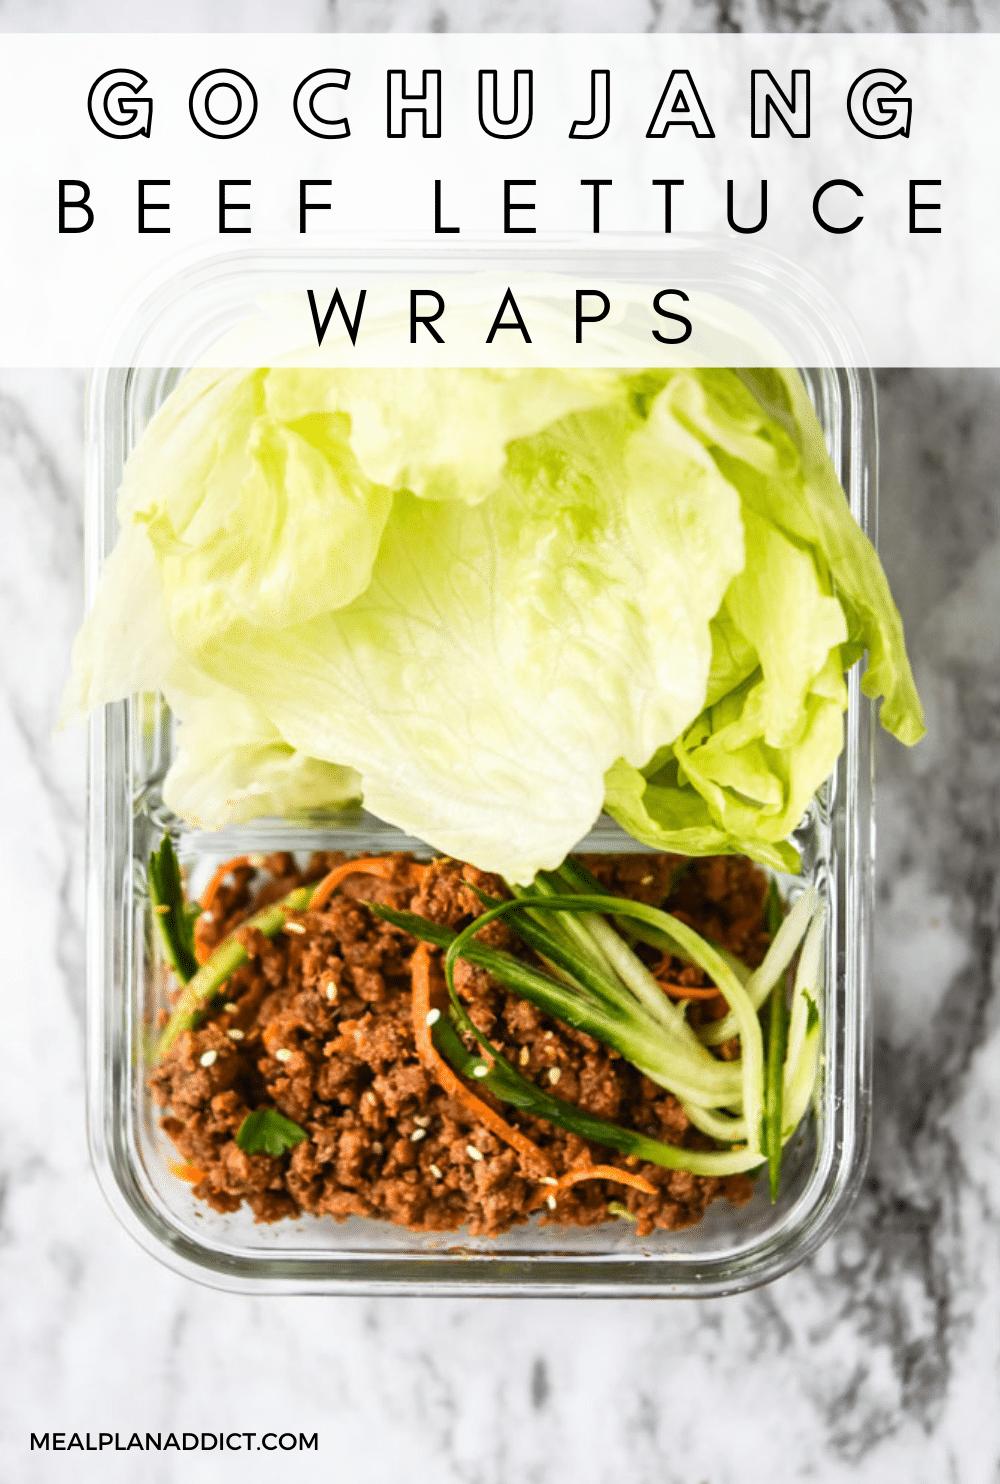 Gochujang Beef Lettuce Wraps   Meal Plan Addict